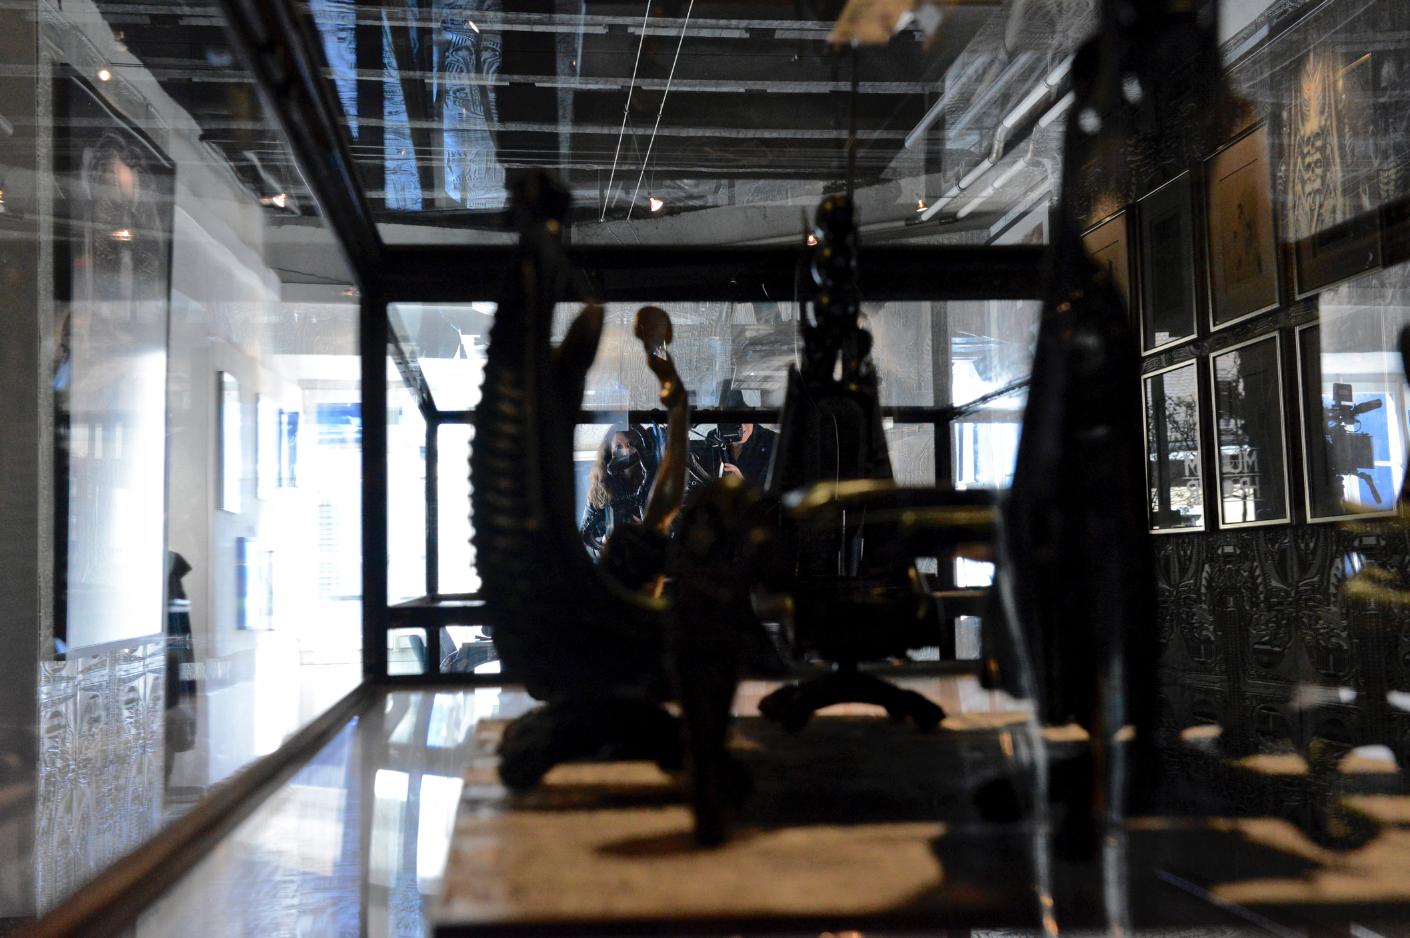 Dreh im Museum HR Giger